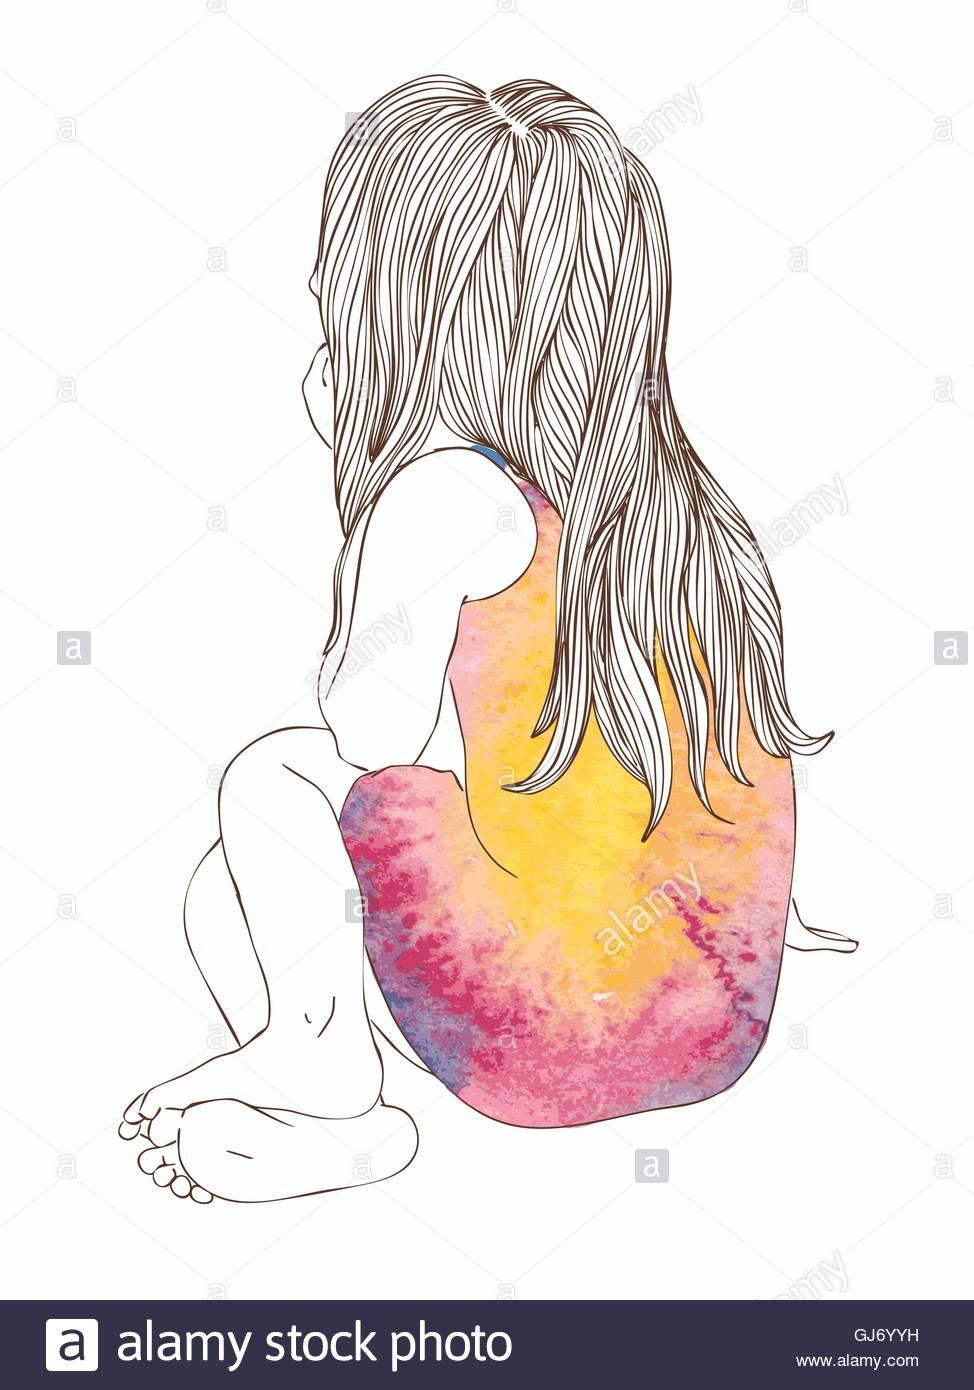 974x1390 Little Girl In A Watercolor Dress Sitting Stock Vector Art